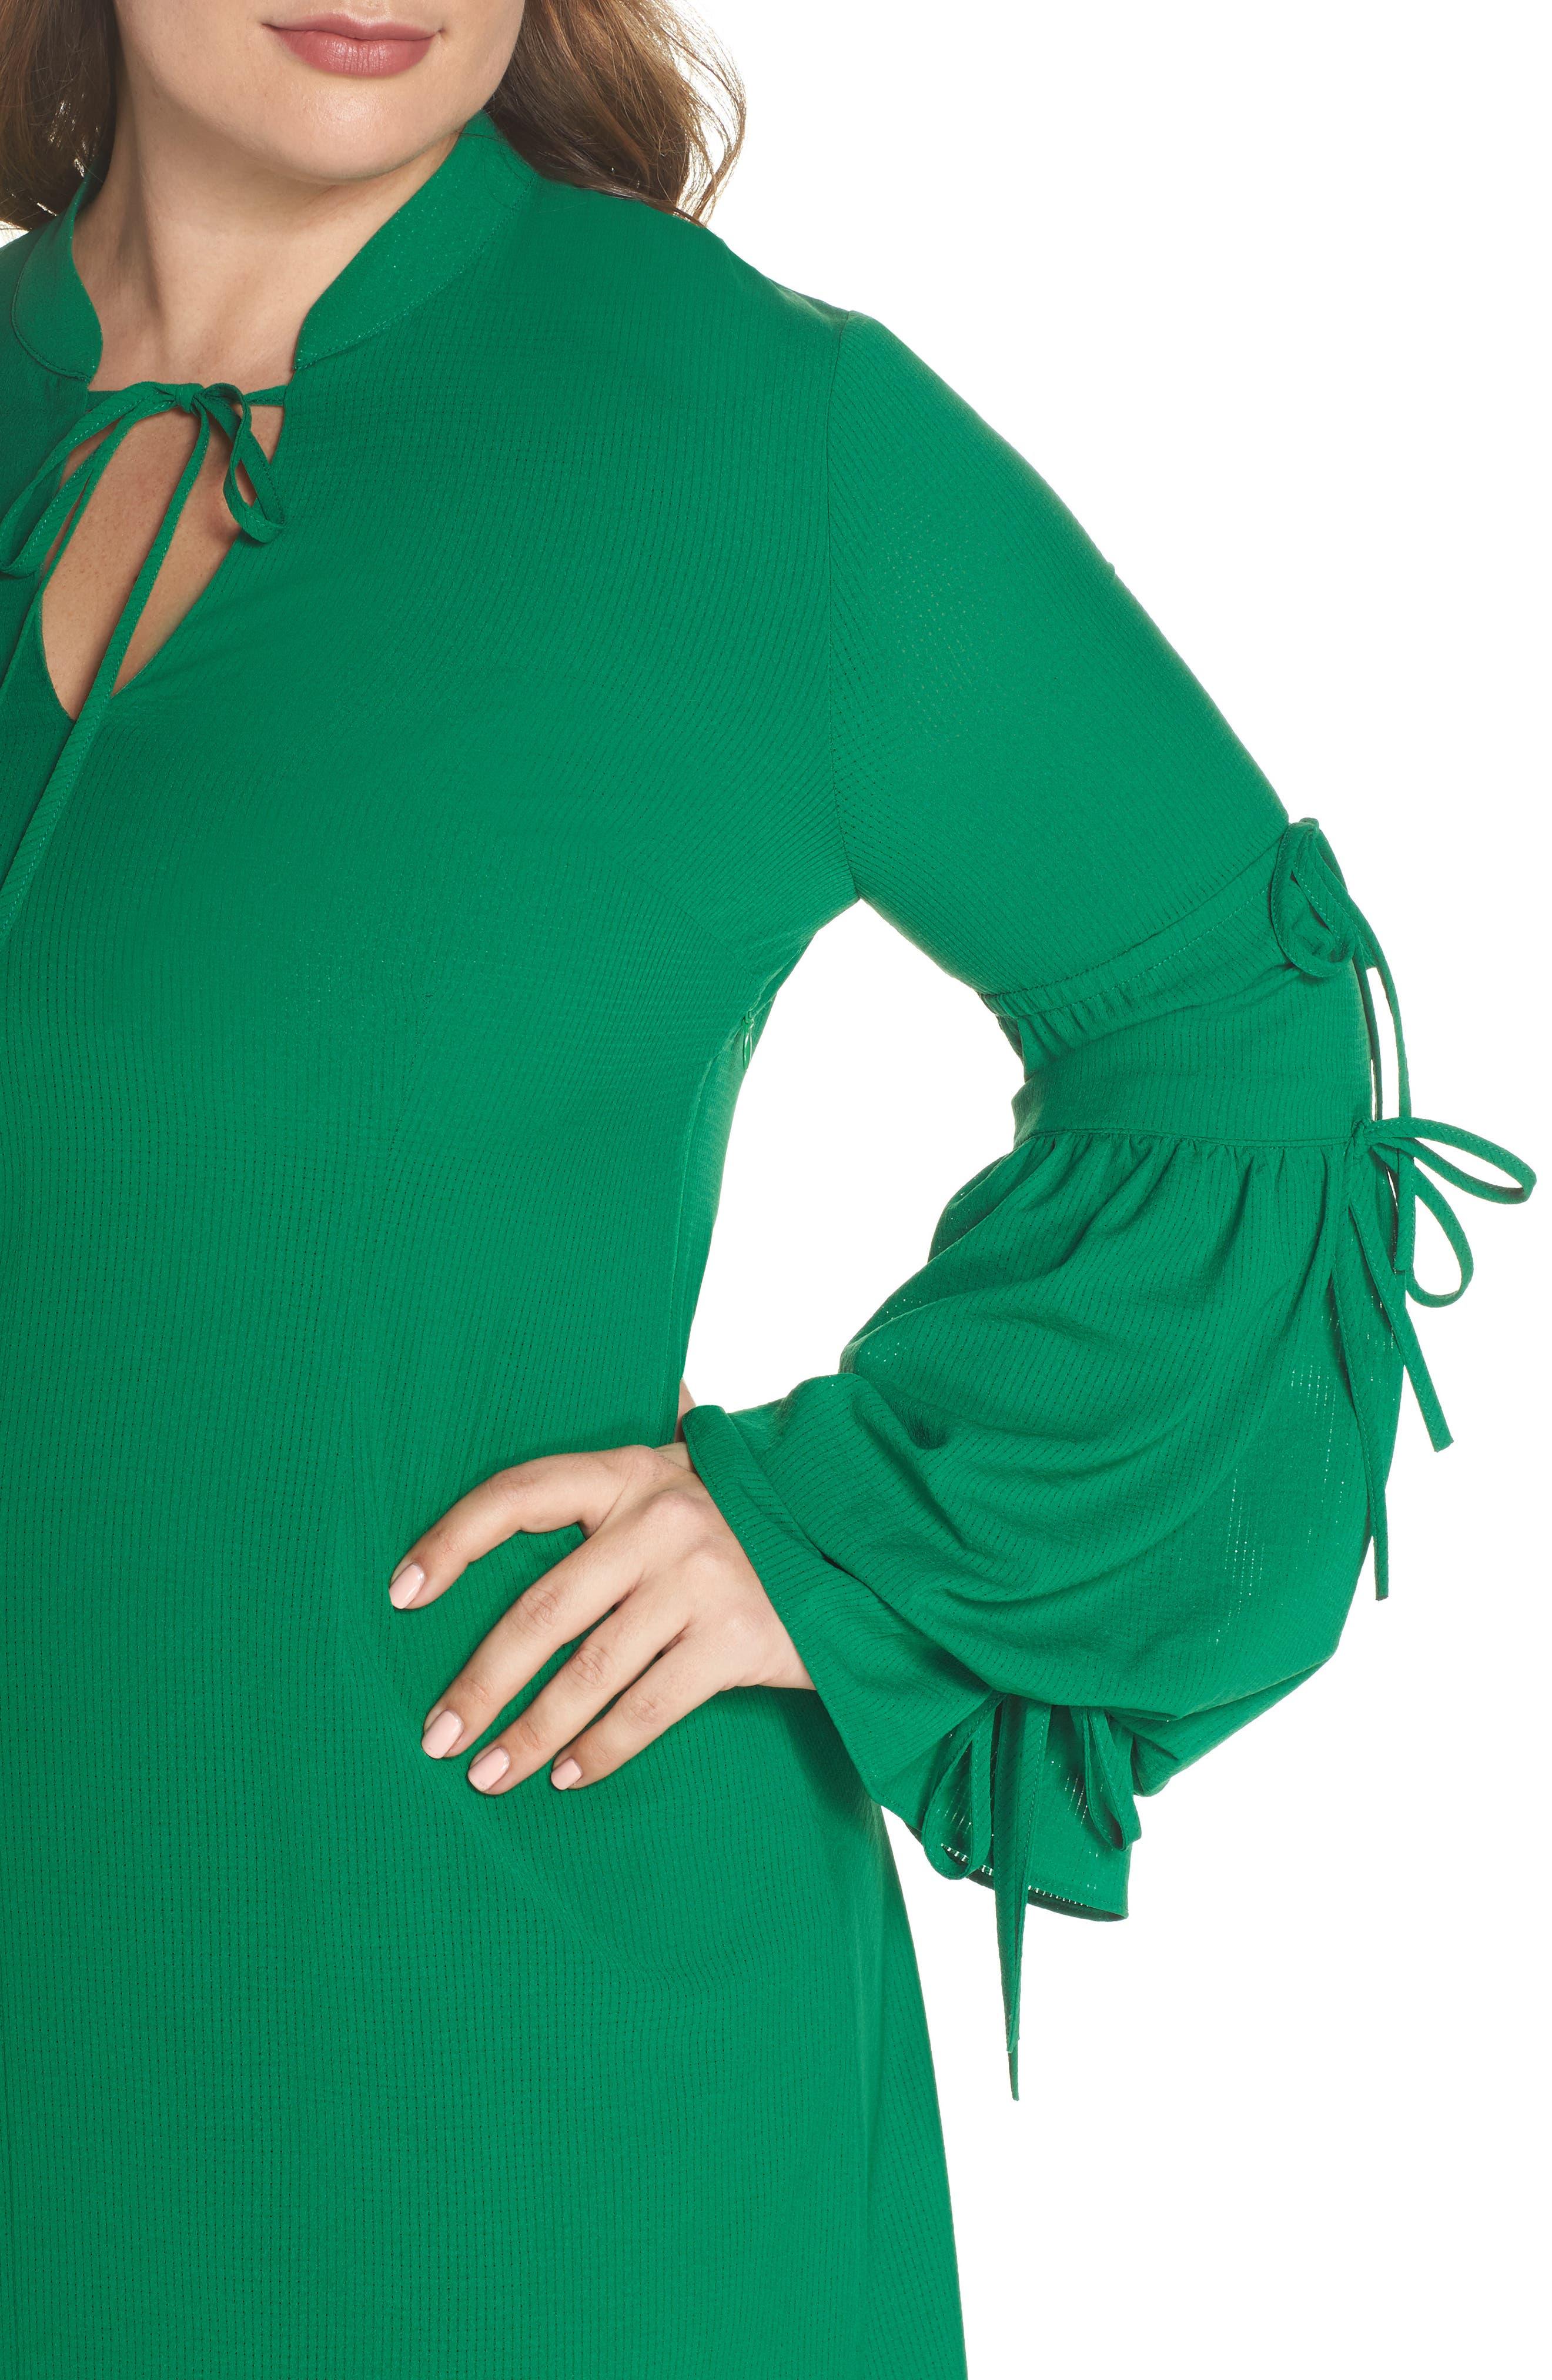 Leiko Antoinette Puff Sleeve Tea Dress,                             Alternate thumbnail 4, color,                             300